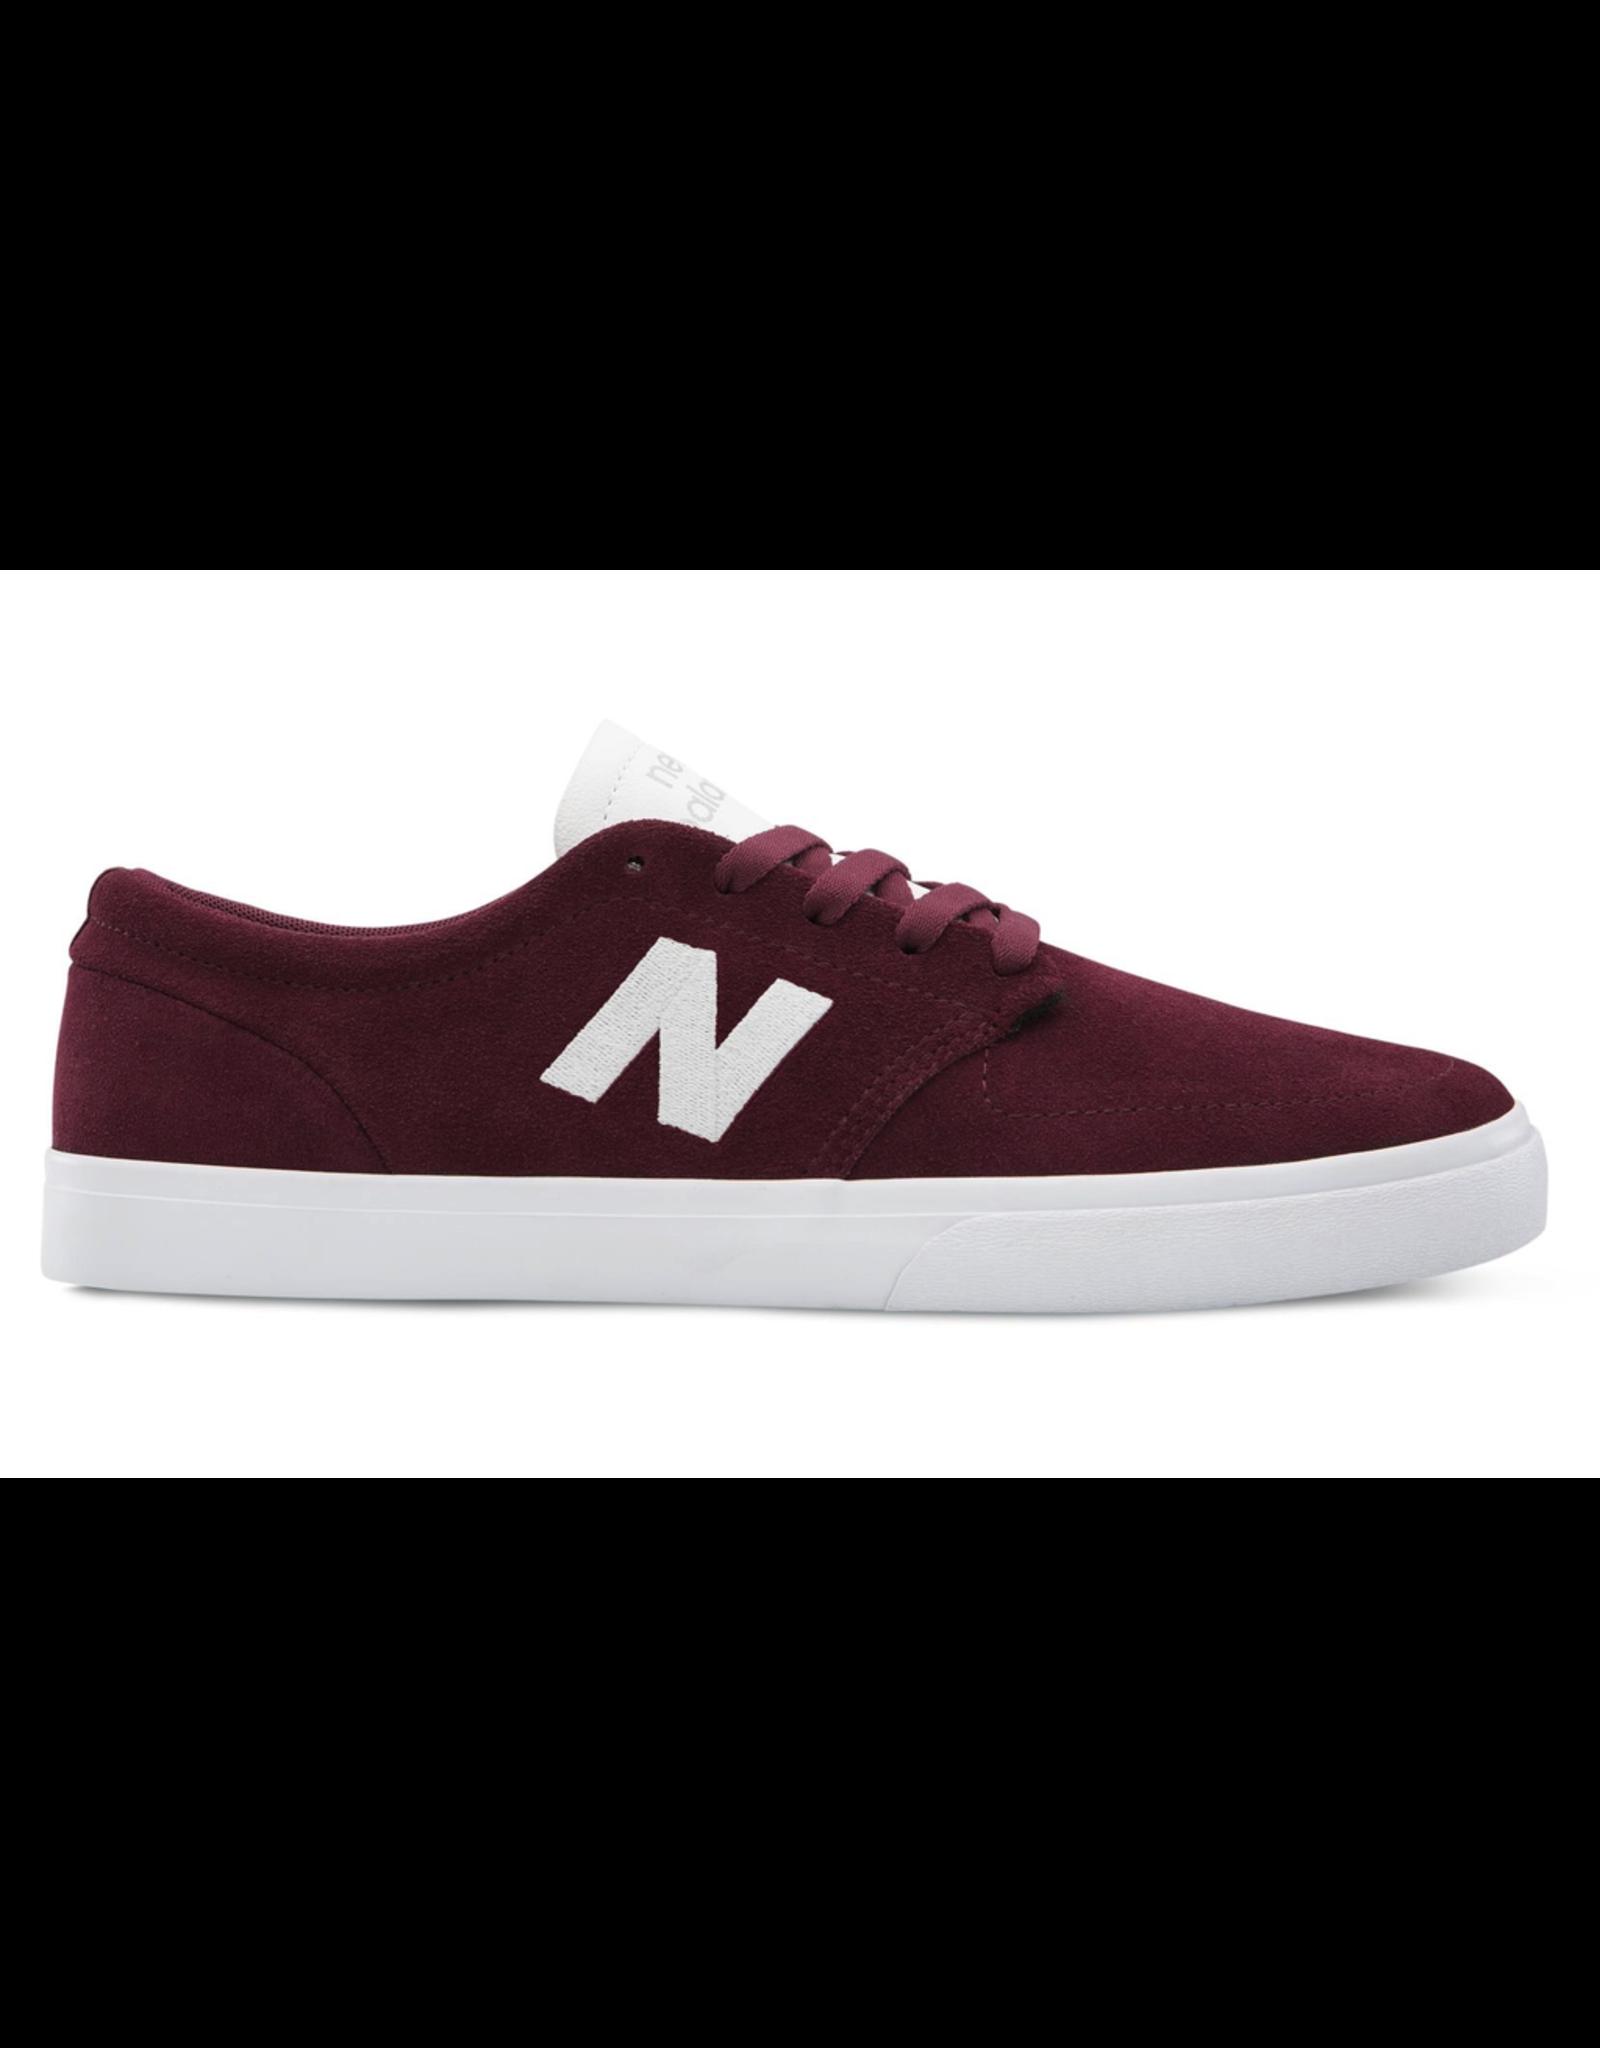 New Balance NB 345 Burgundy White